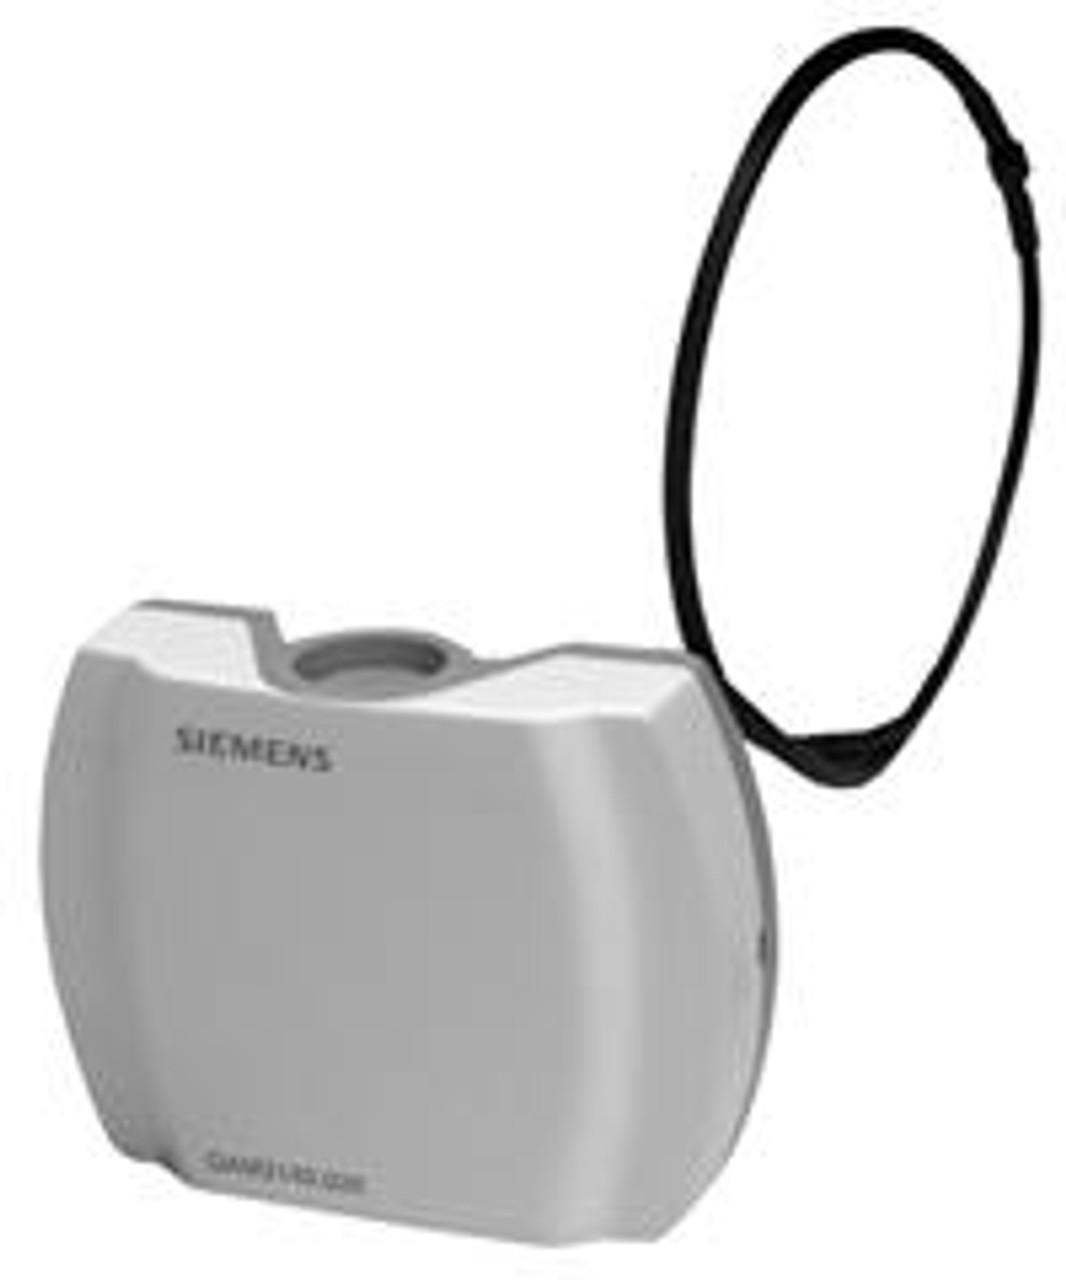 Siemens QAM2110.040